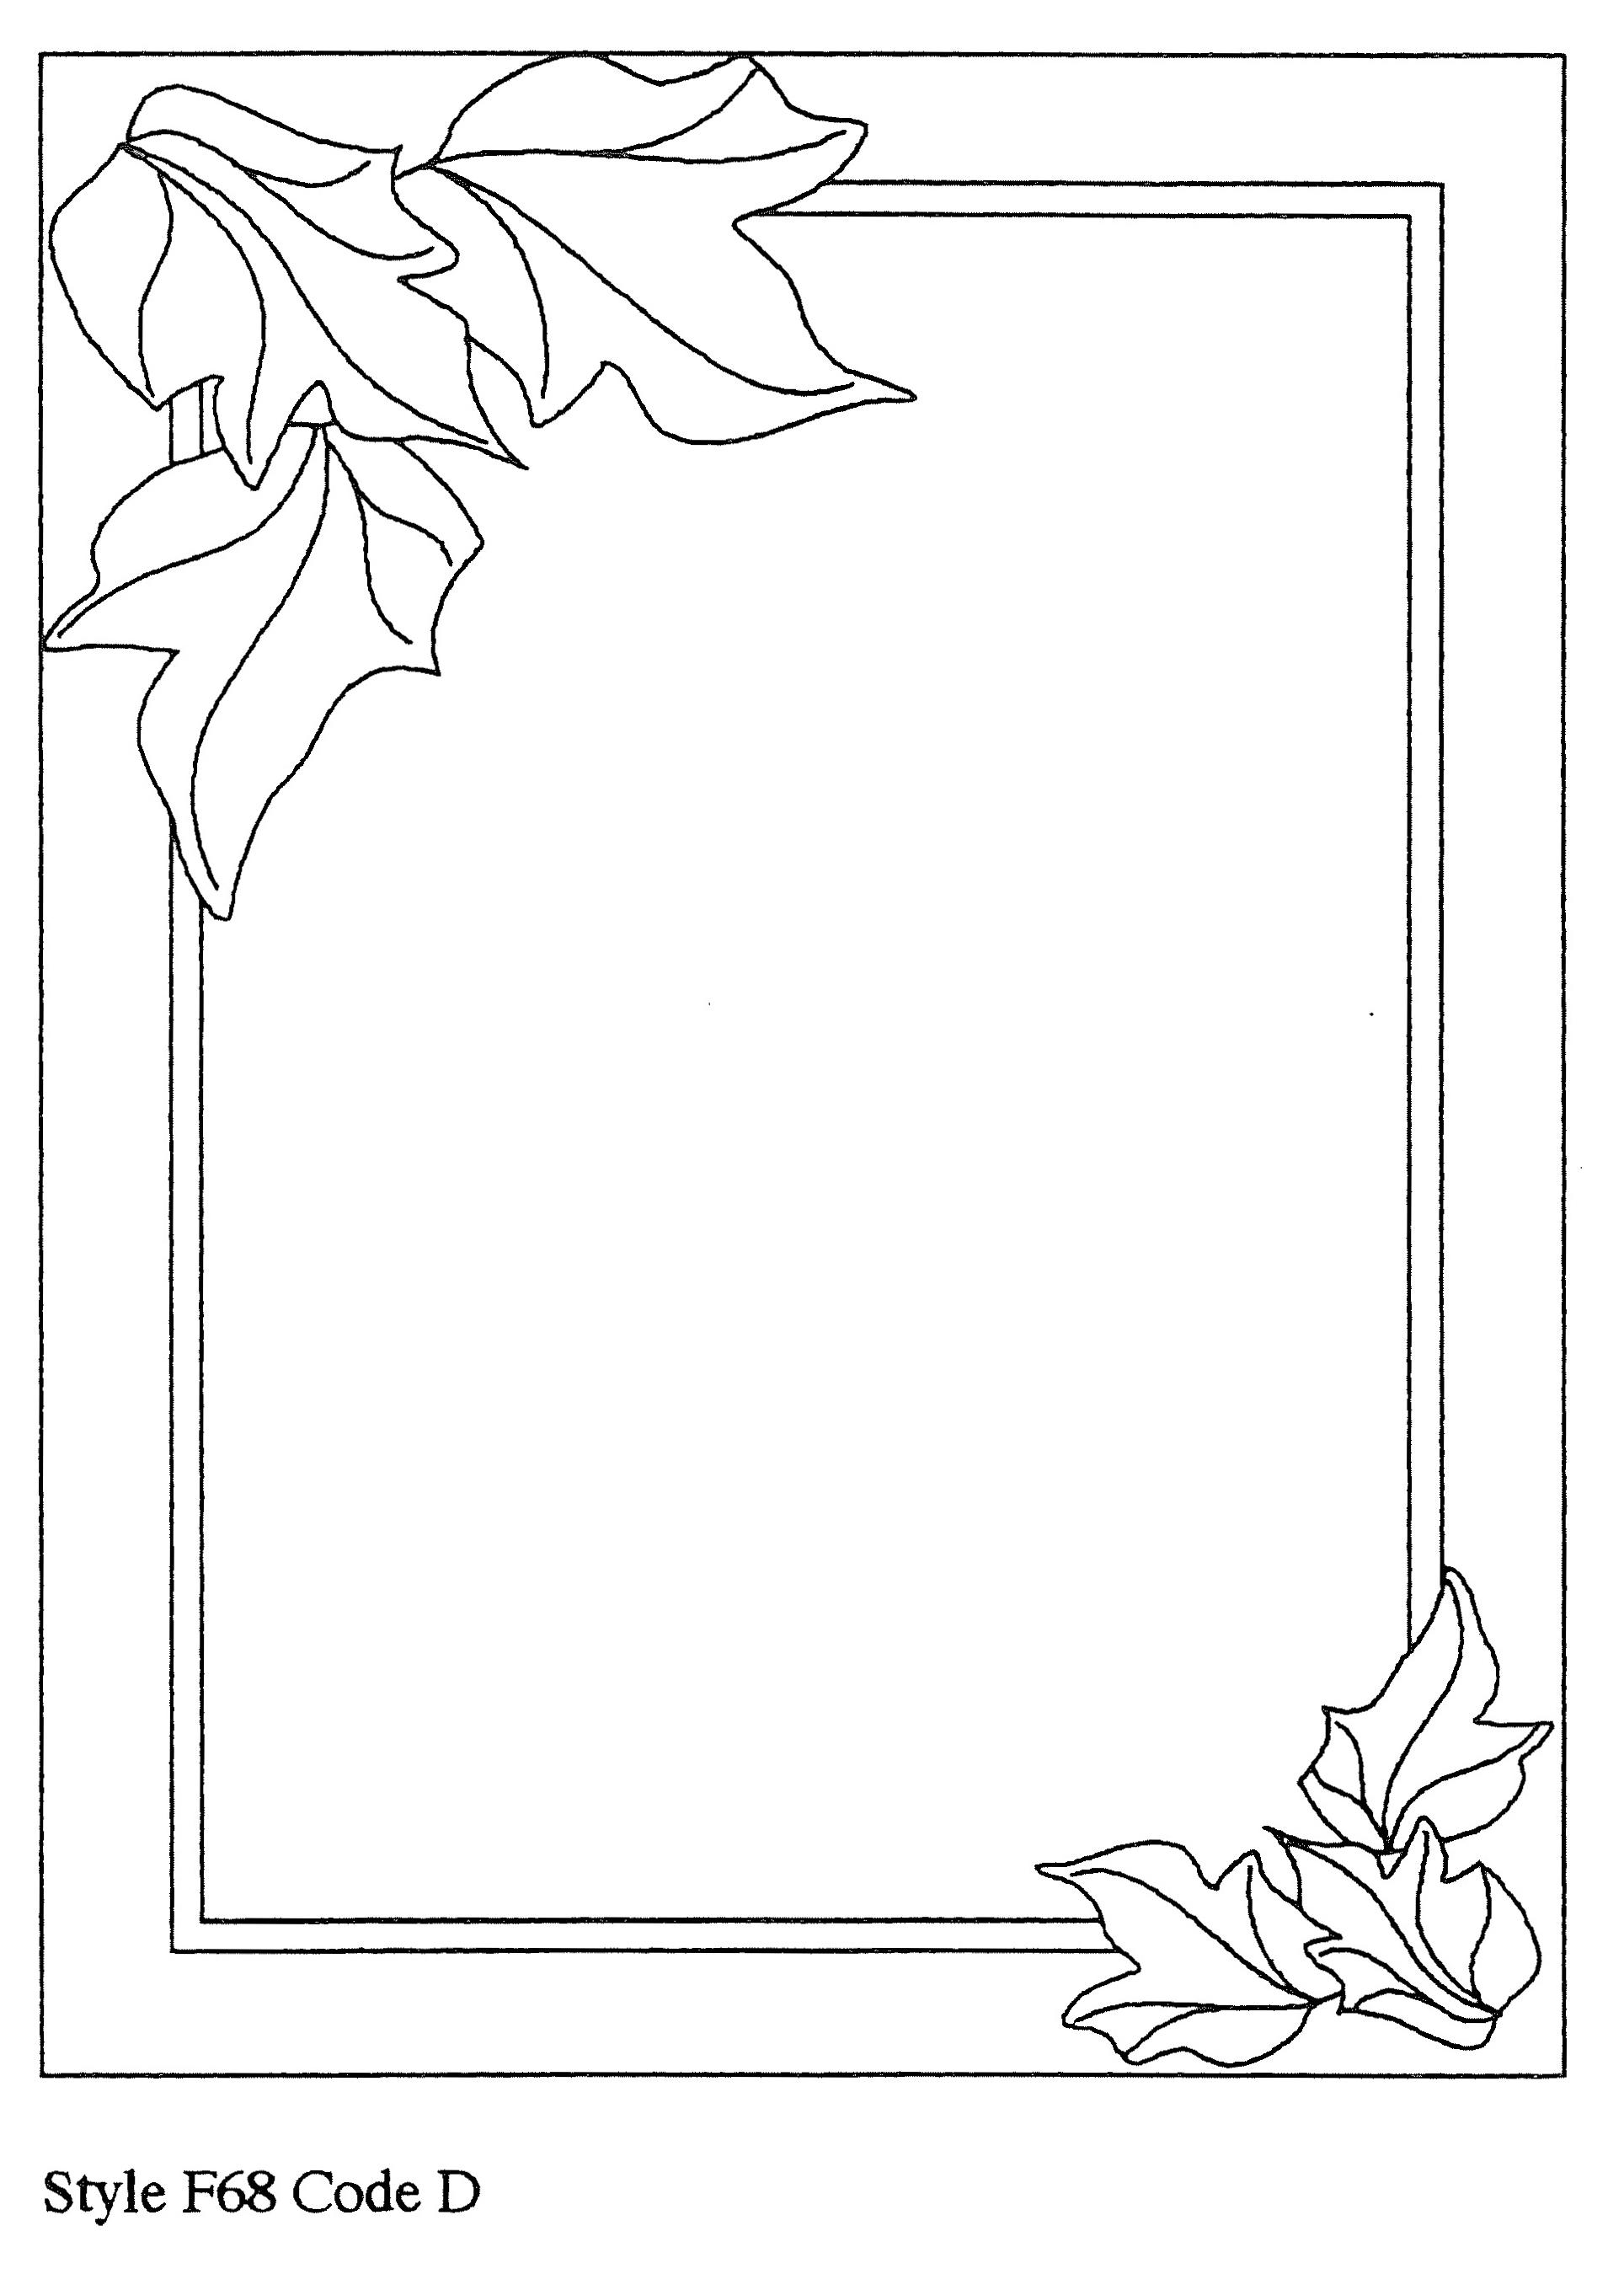 Page 29 copy 3.jpg